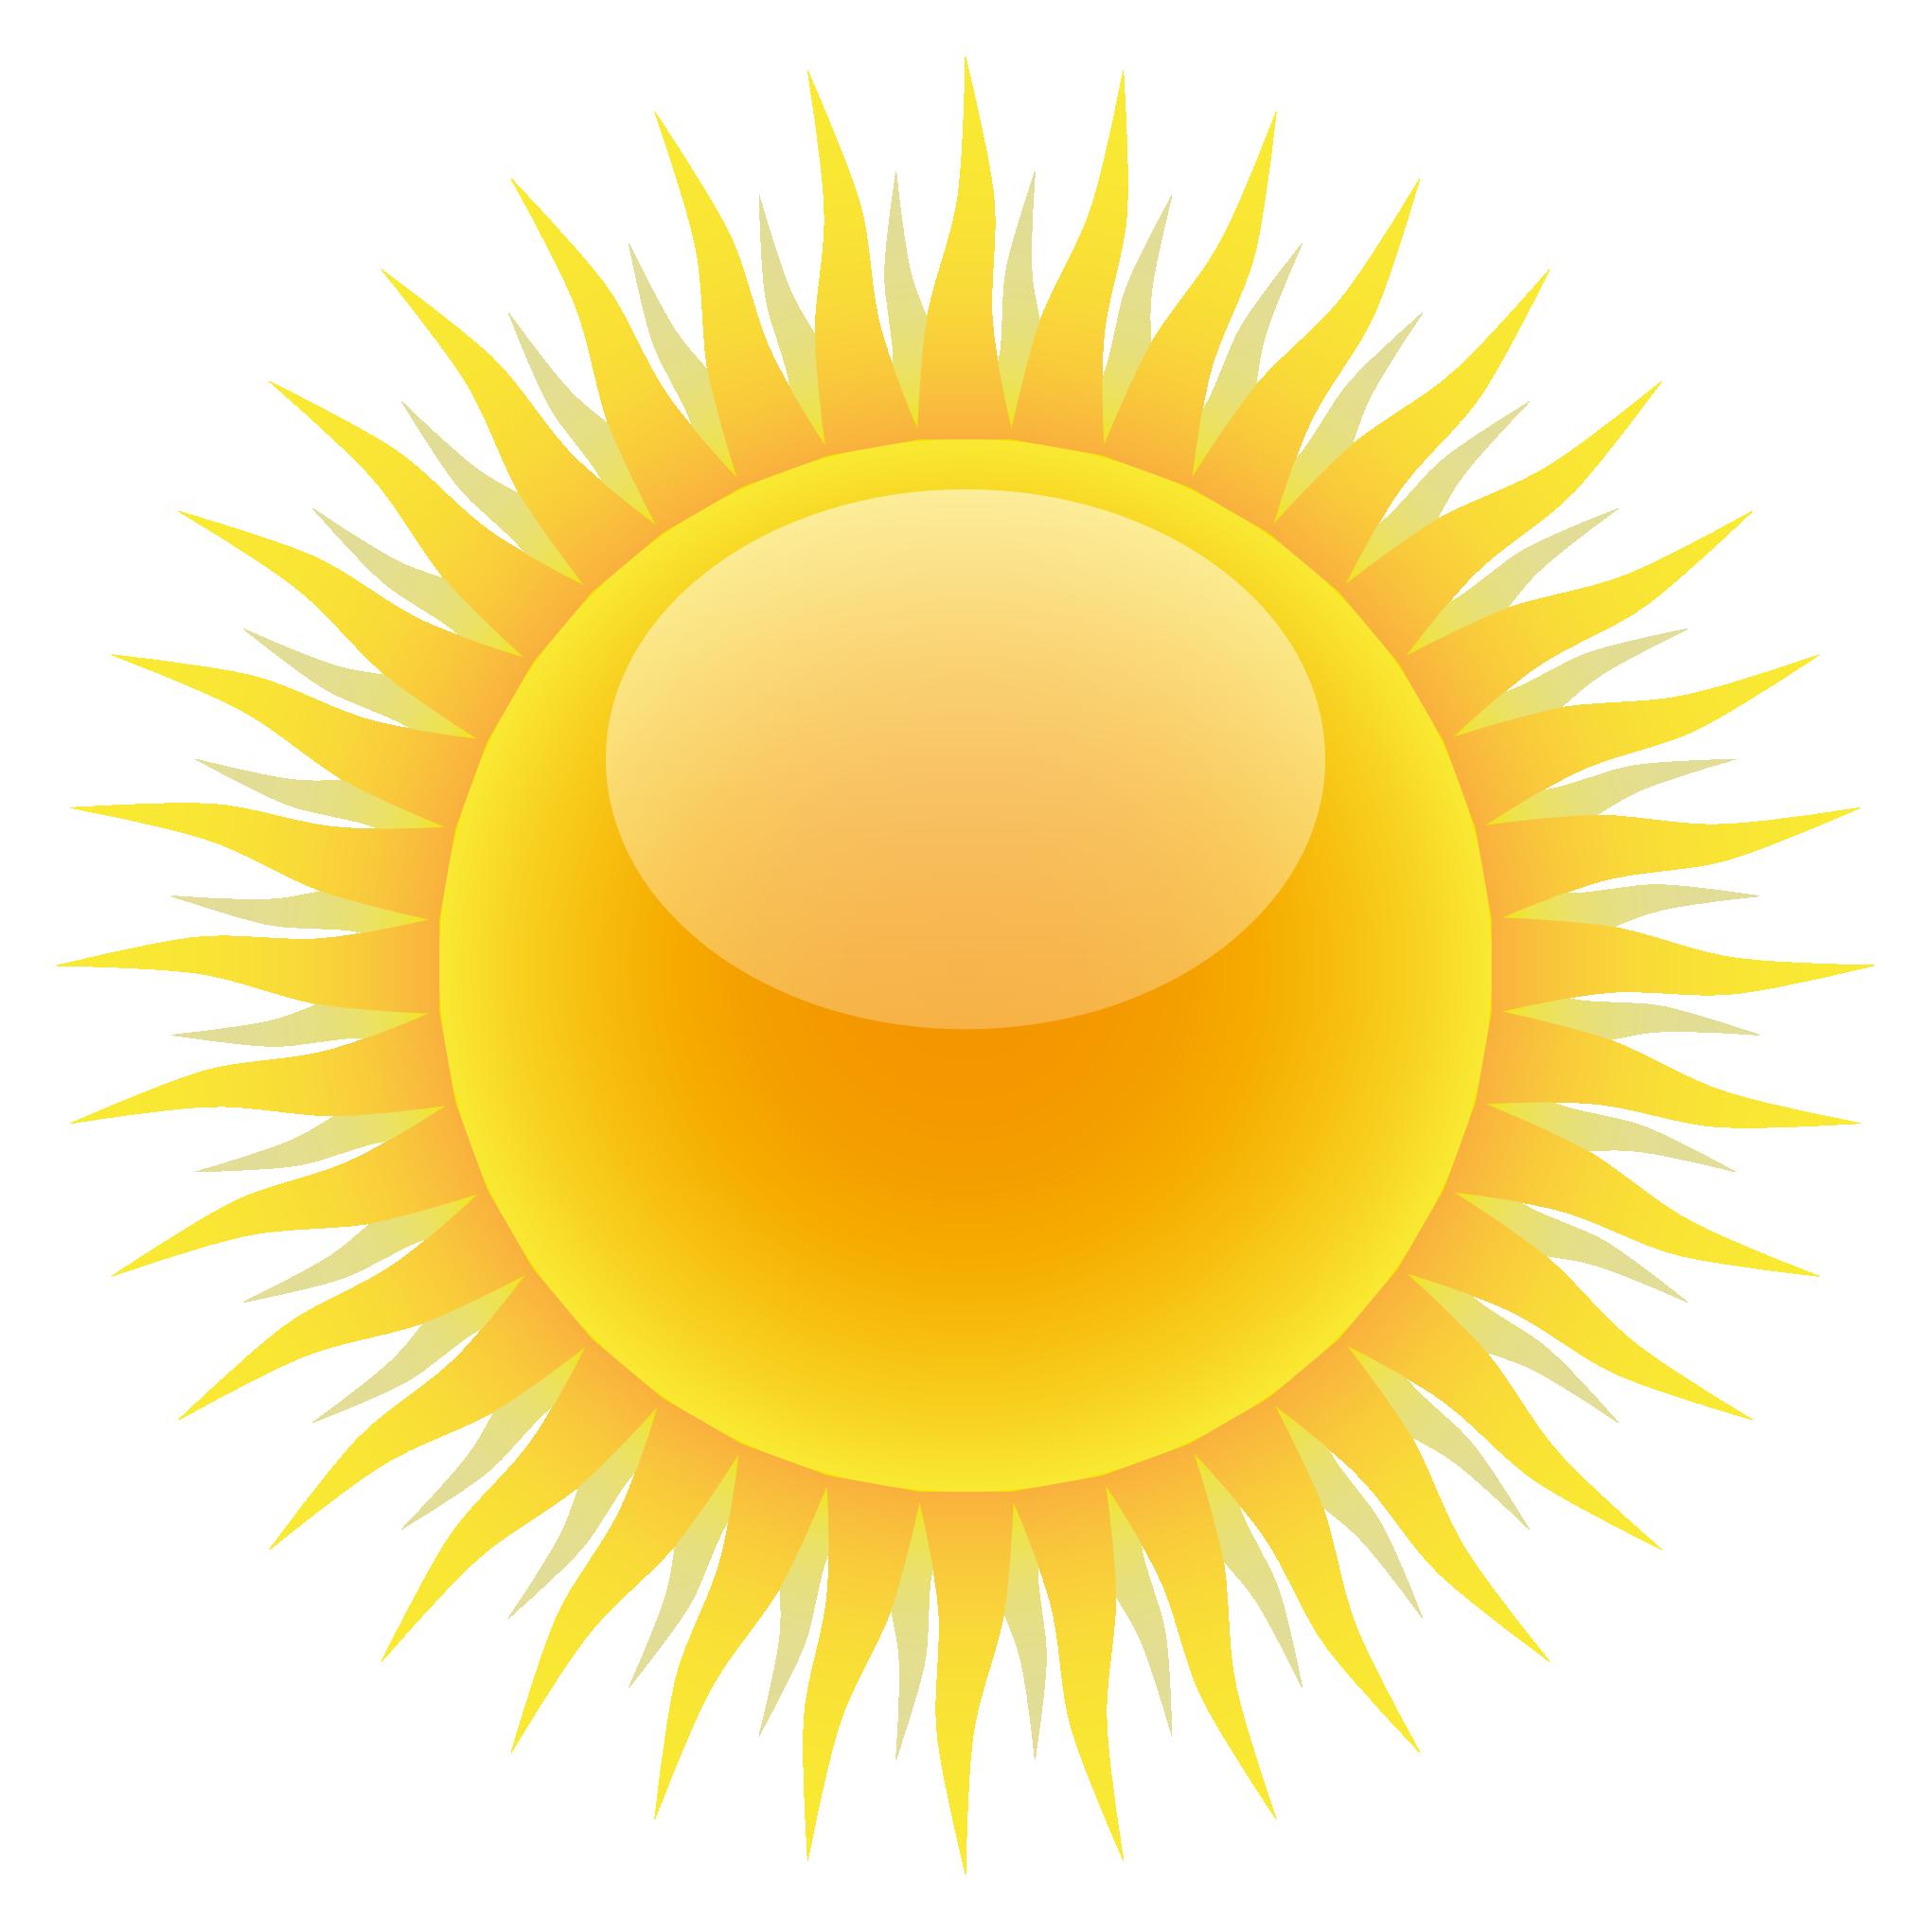 Sun Png Image Sun Clip Art Clip Art Sun Art